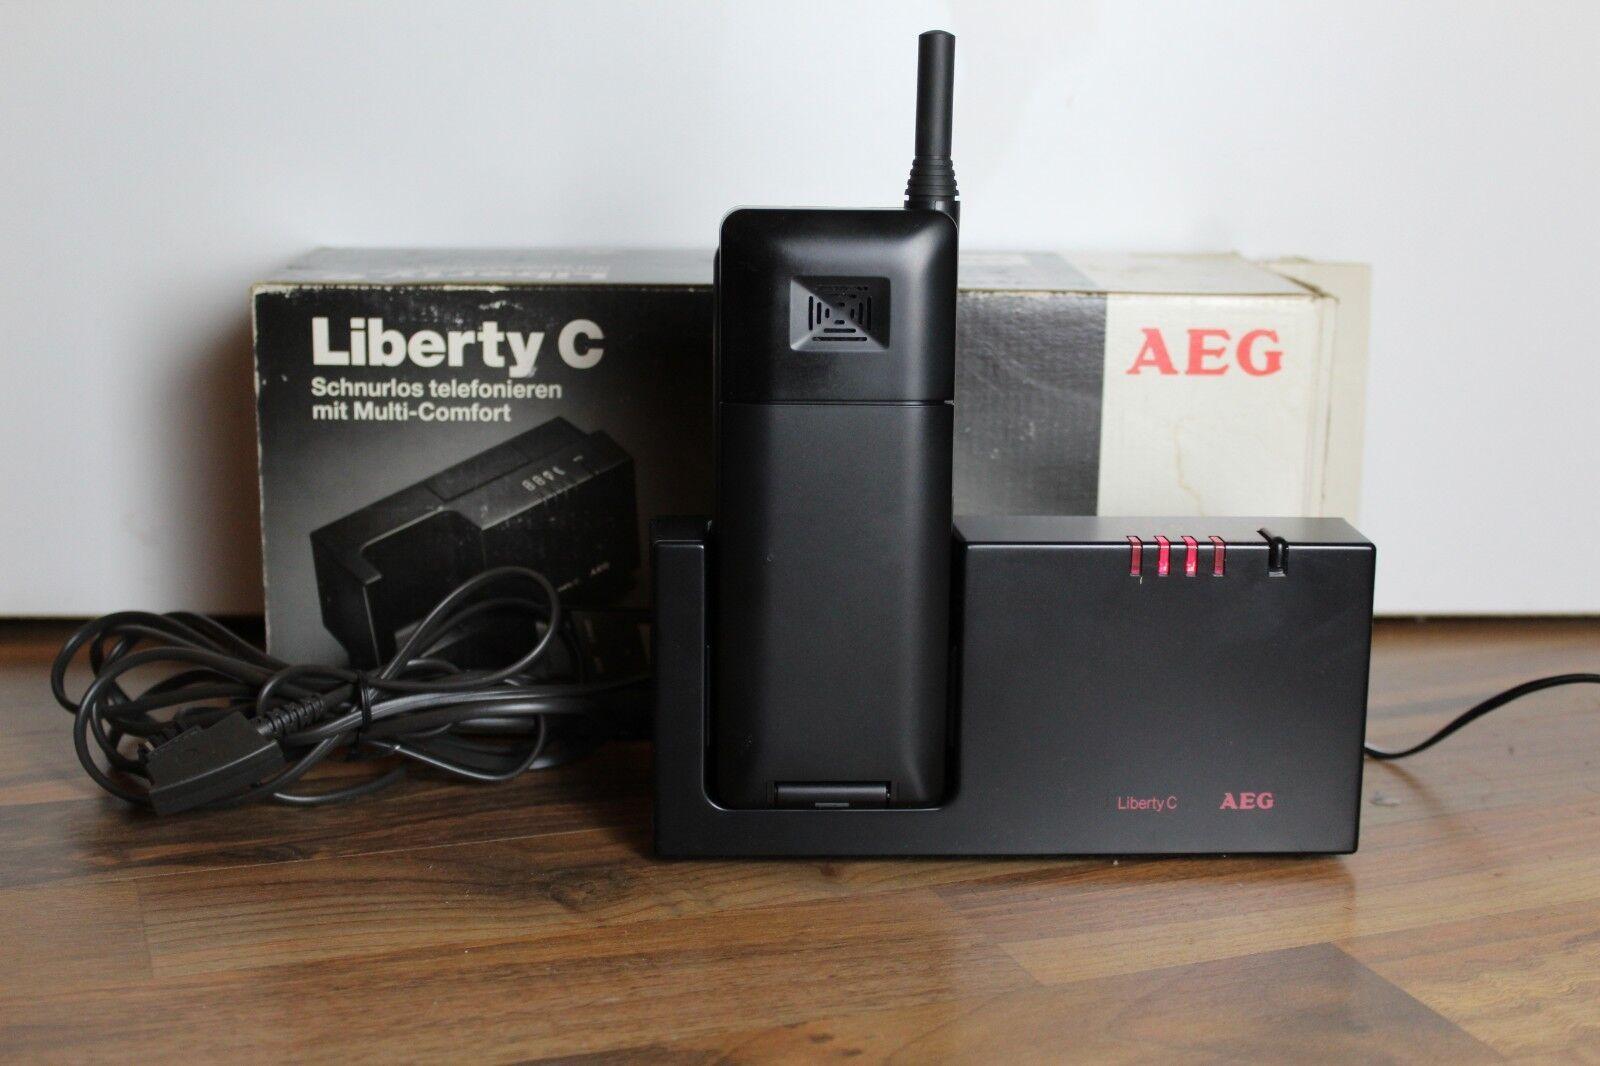 AEG LIBERTY C TELEFON RAR* Schnurlos Schnurloses Telefon